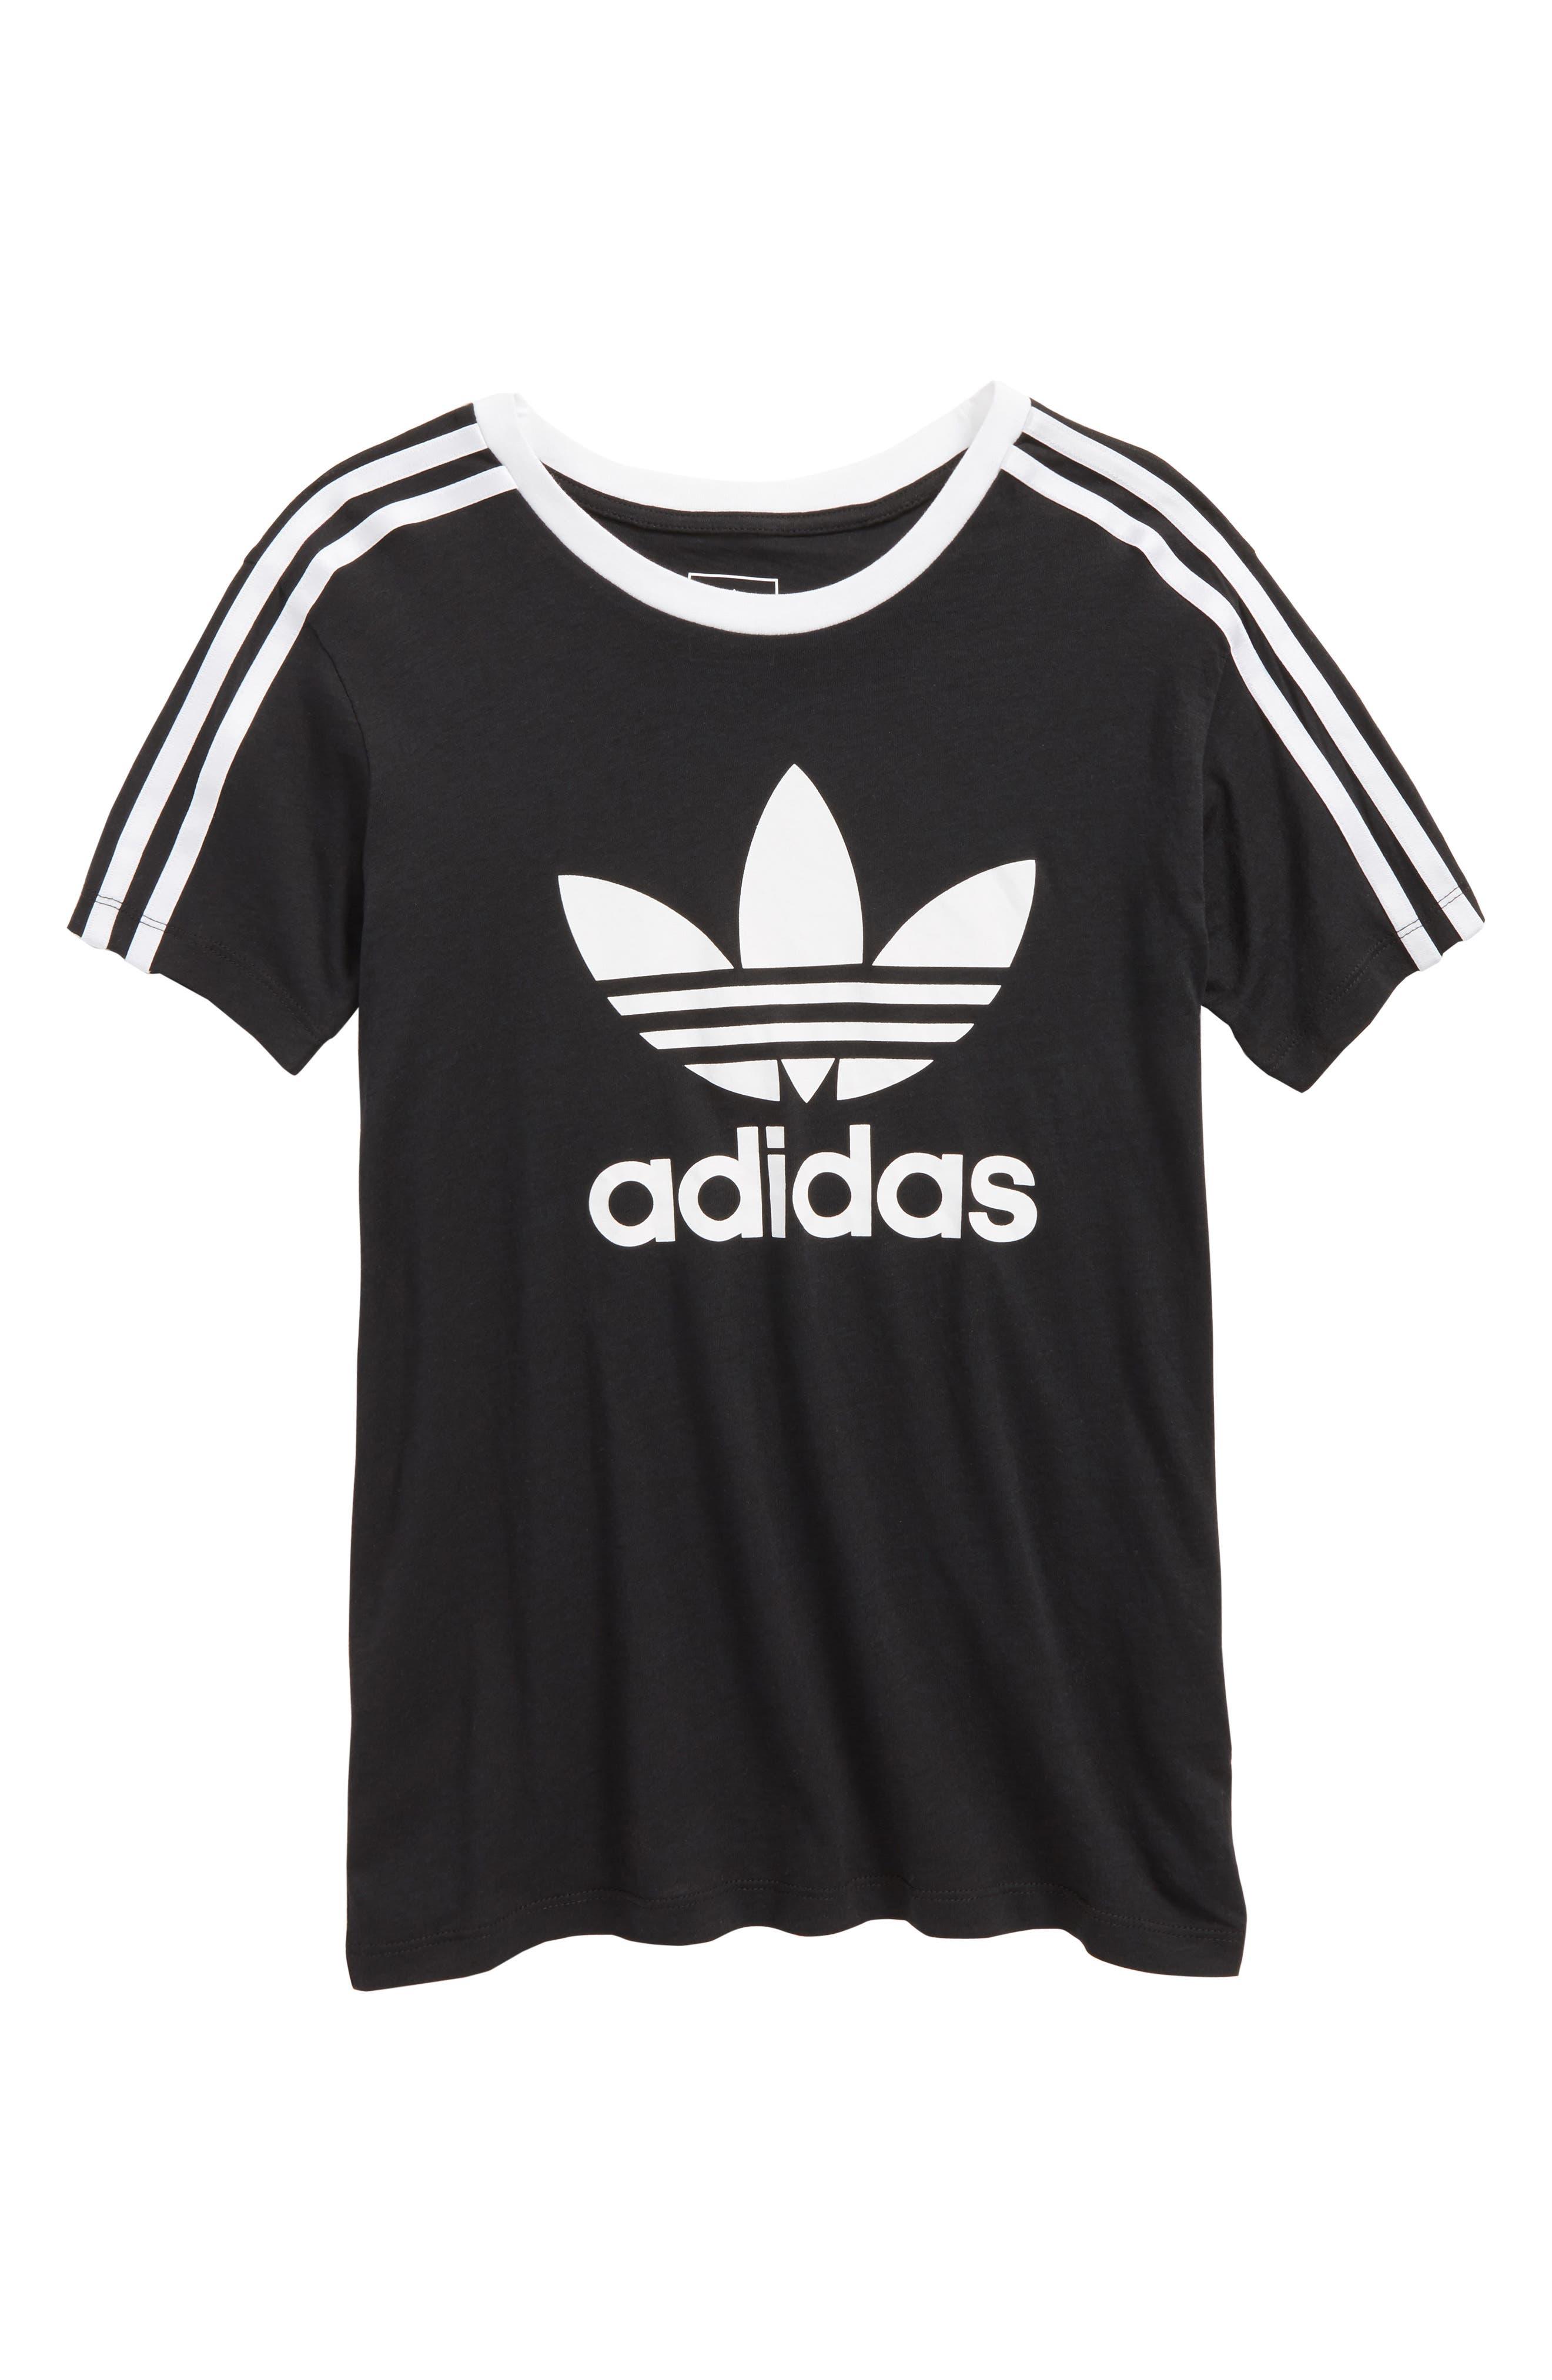 adidas Originals Logo Graphic Tee (Little Girls & Big Girls)